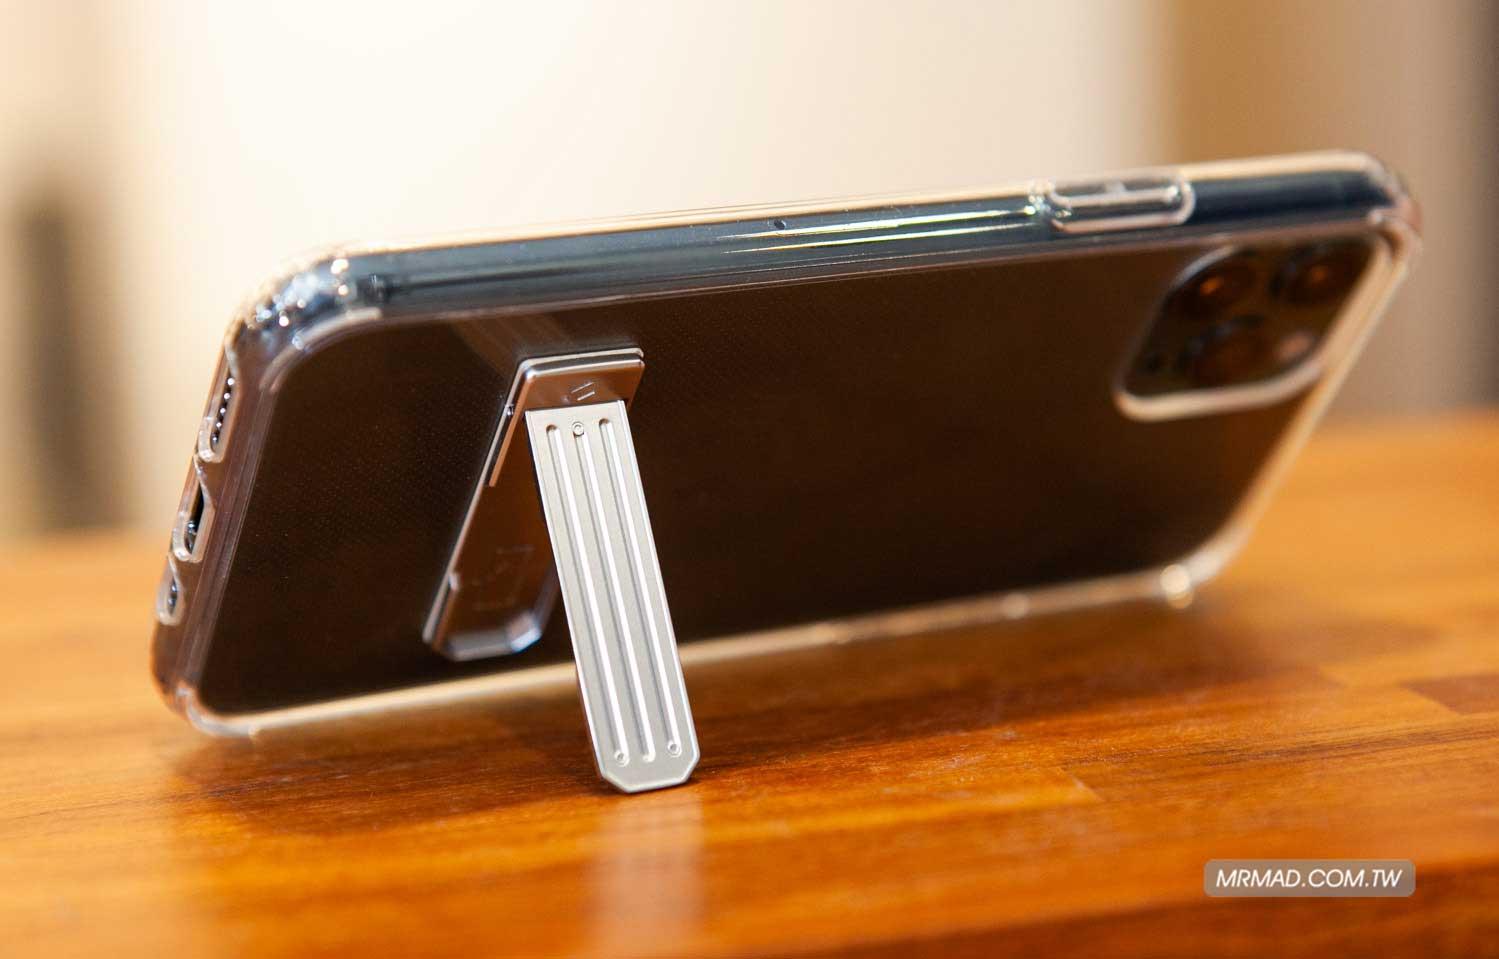 JTLEGEND Wavyee 防摔殼開箱評測,適合追求運動風外型iPhone 11、11 Pro防摔殼